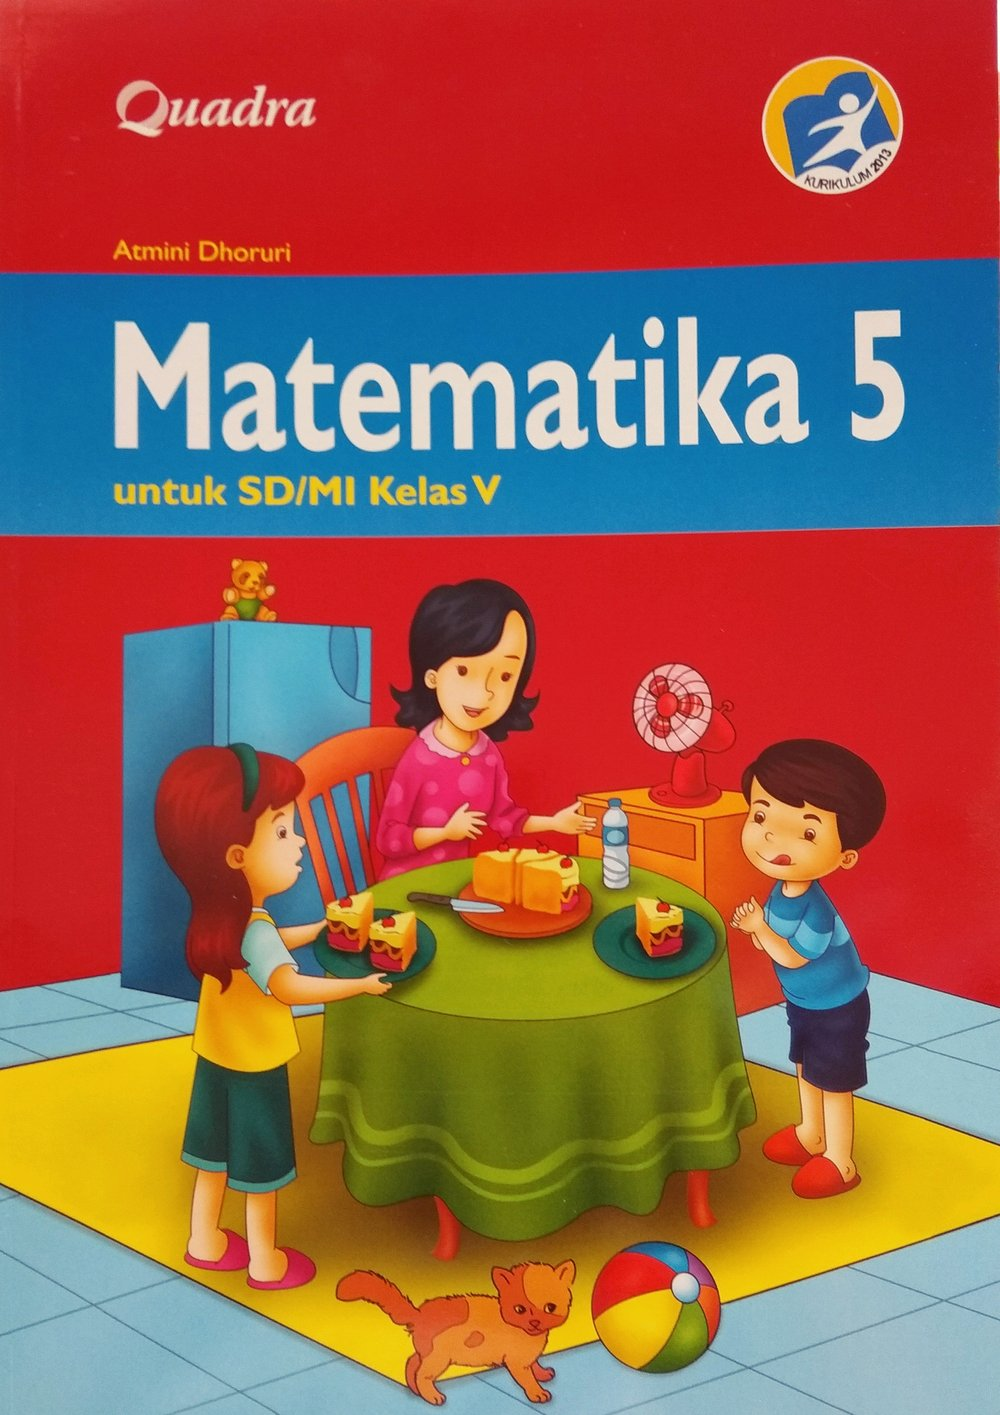 Inilah pembahasan lengkap terkait kunci jawaban buku matematika kelas 6 kurikulum 2013 penerbit quadra. Download Buku Matematika Kelas 5 Quadra Pdf Siswapelajar Com